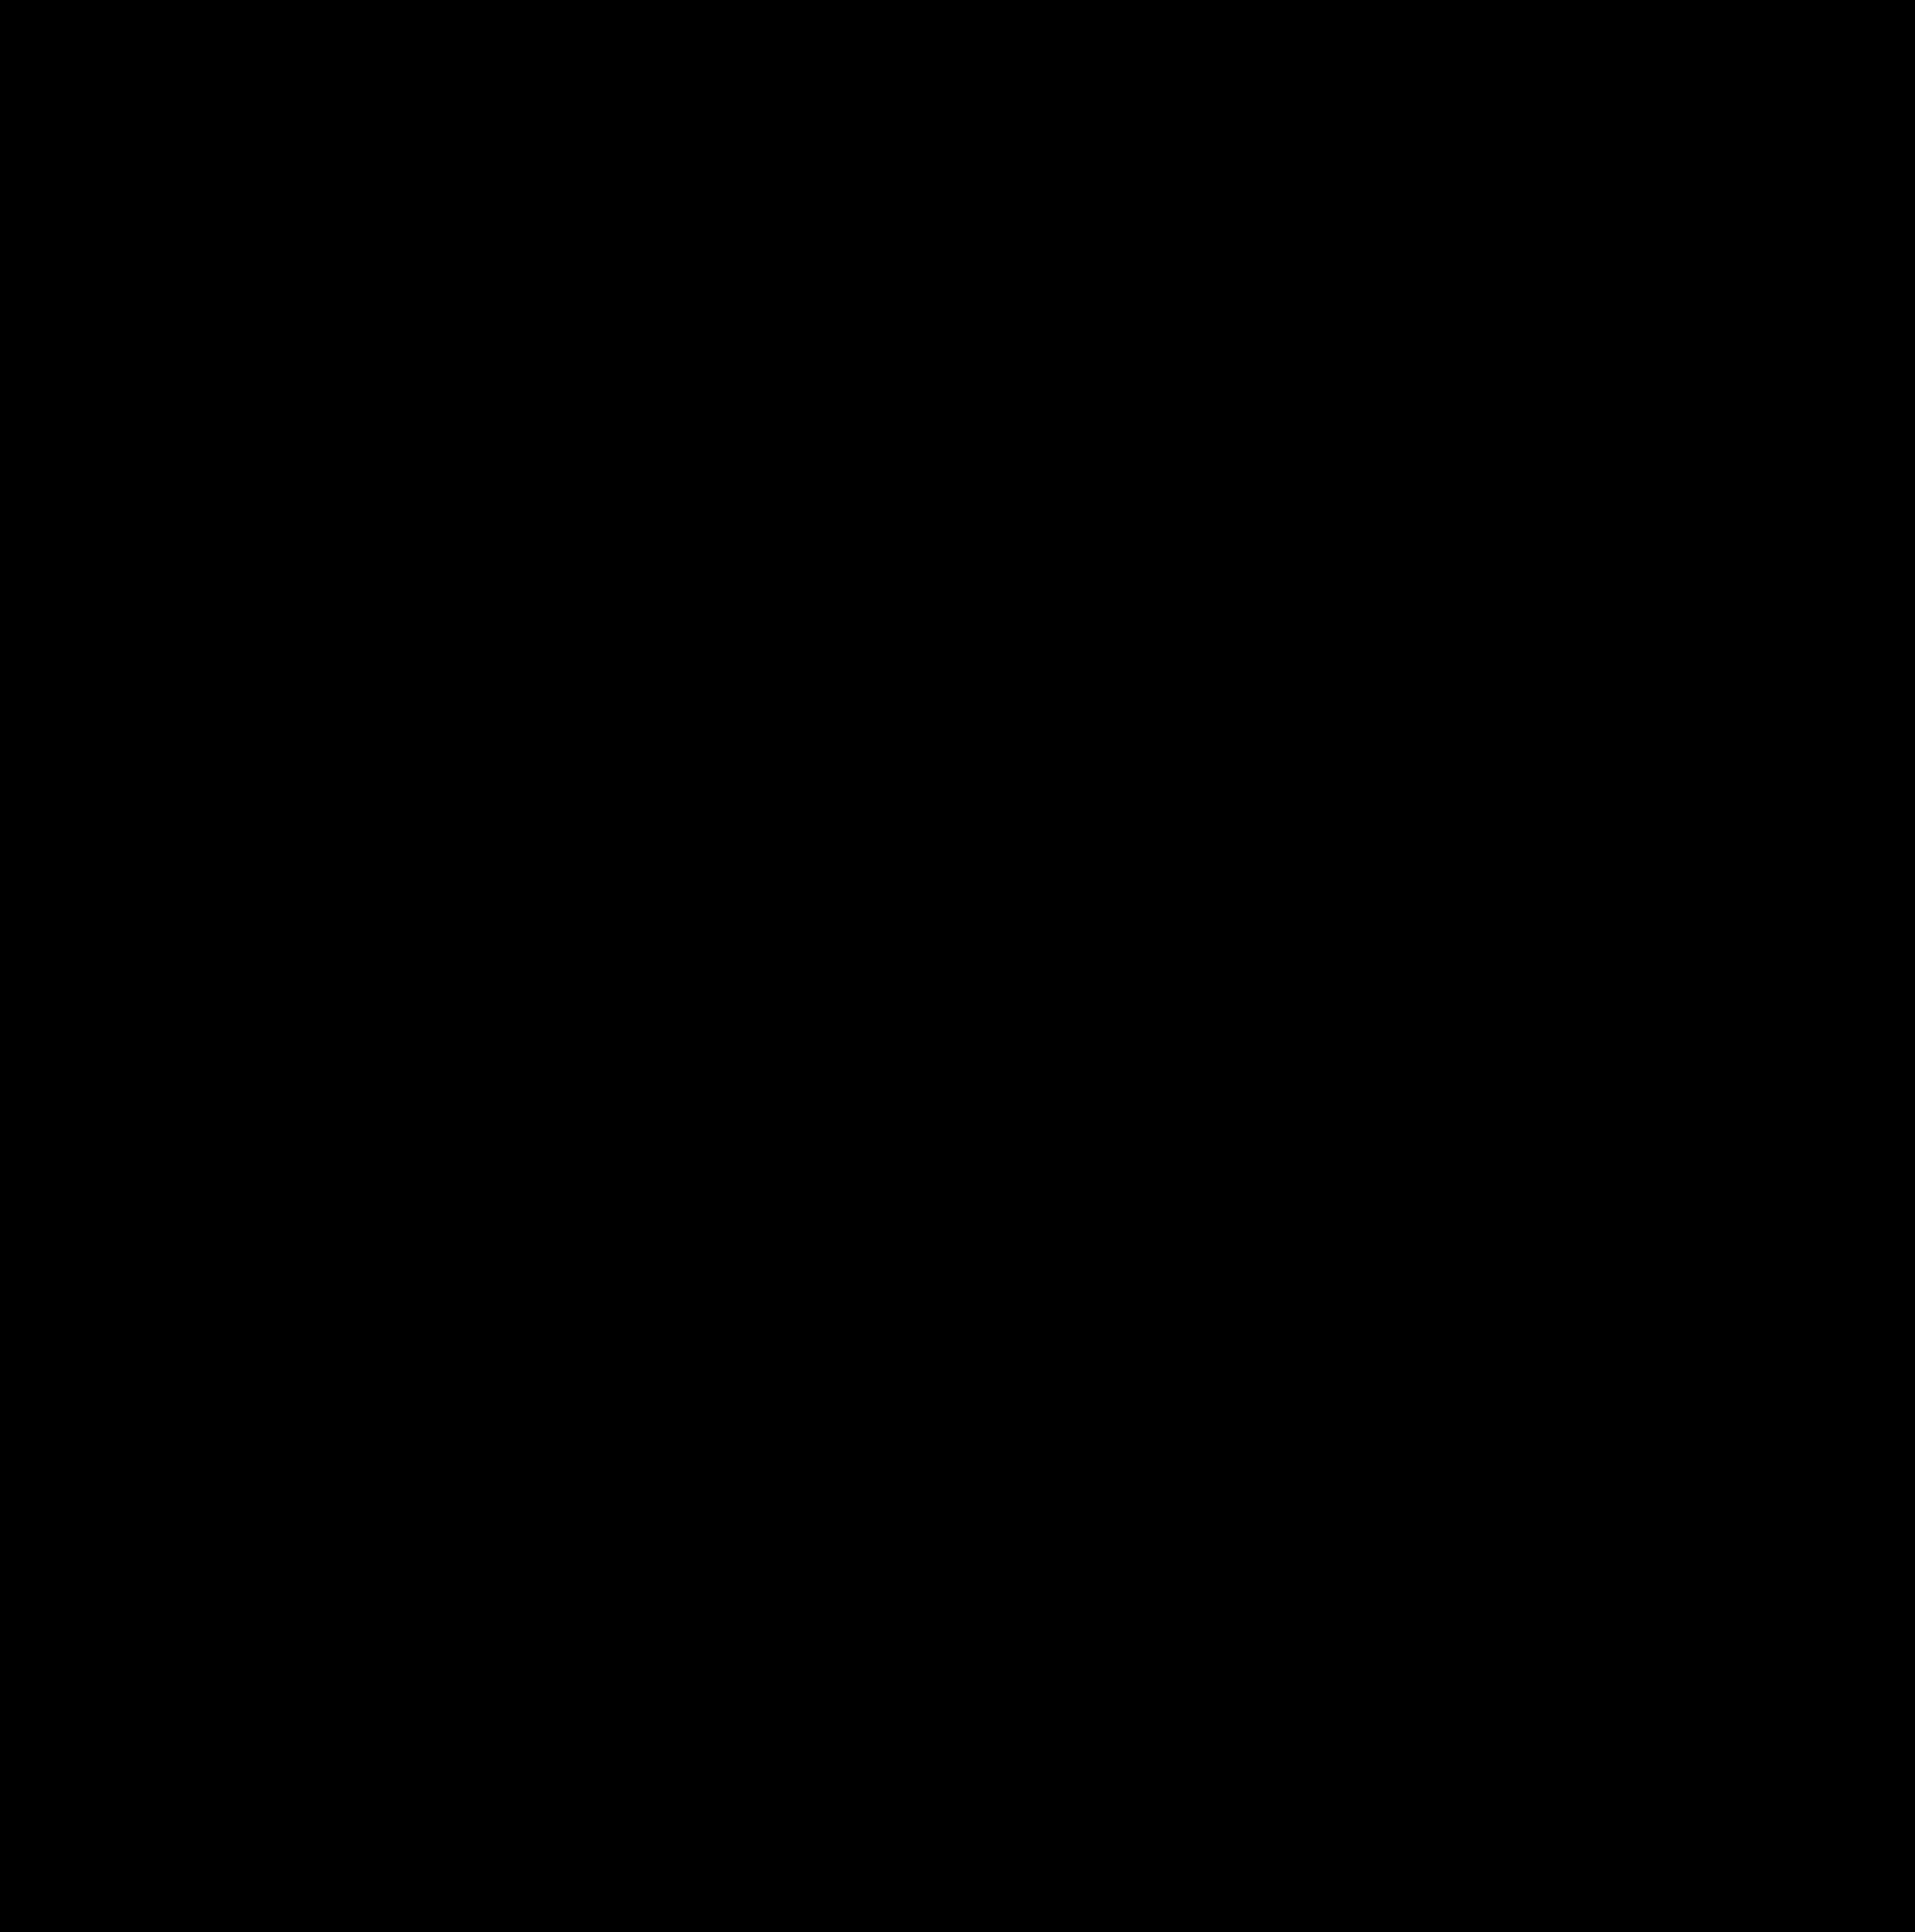 black right arrow